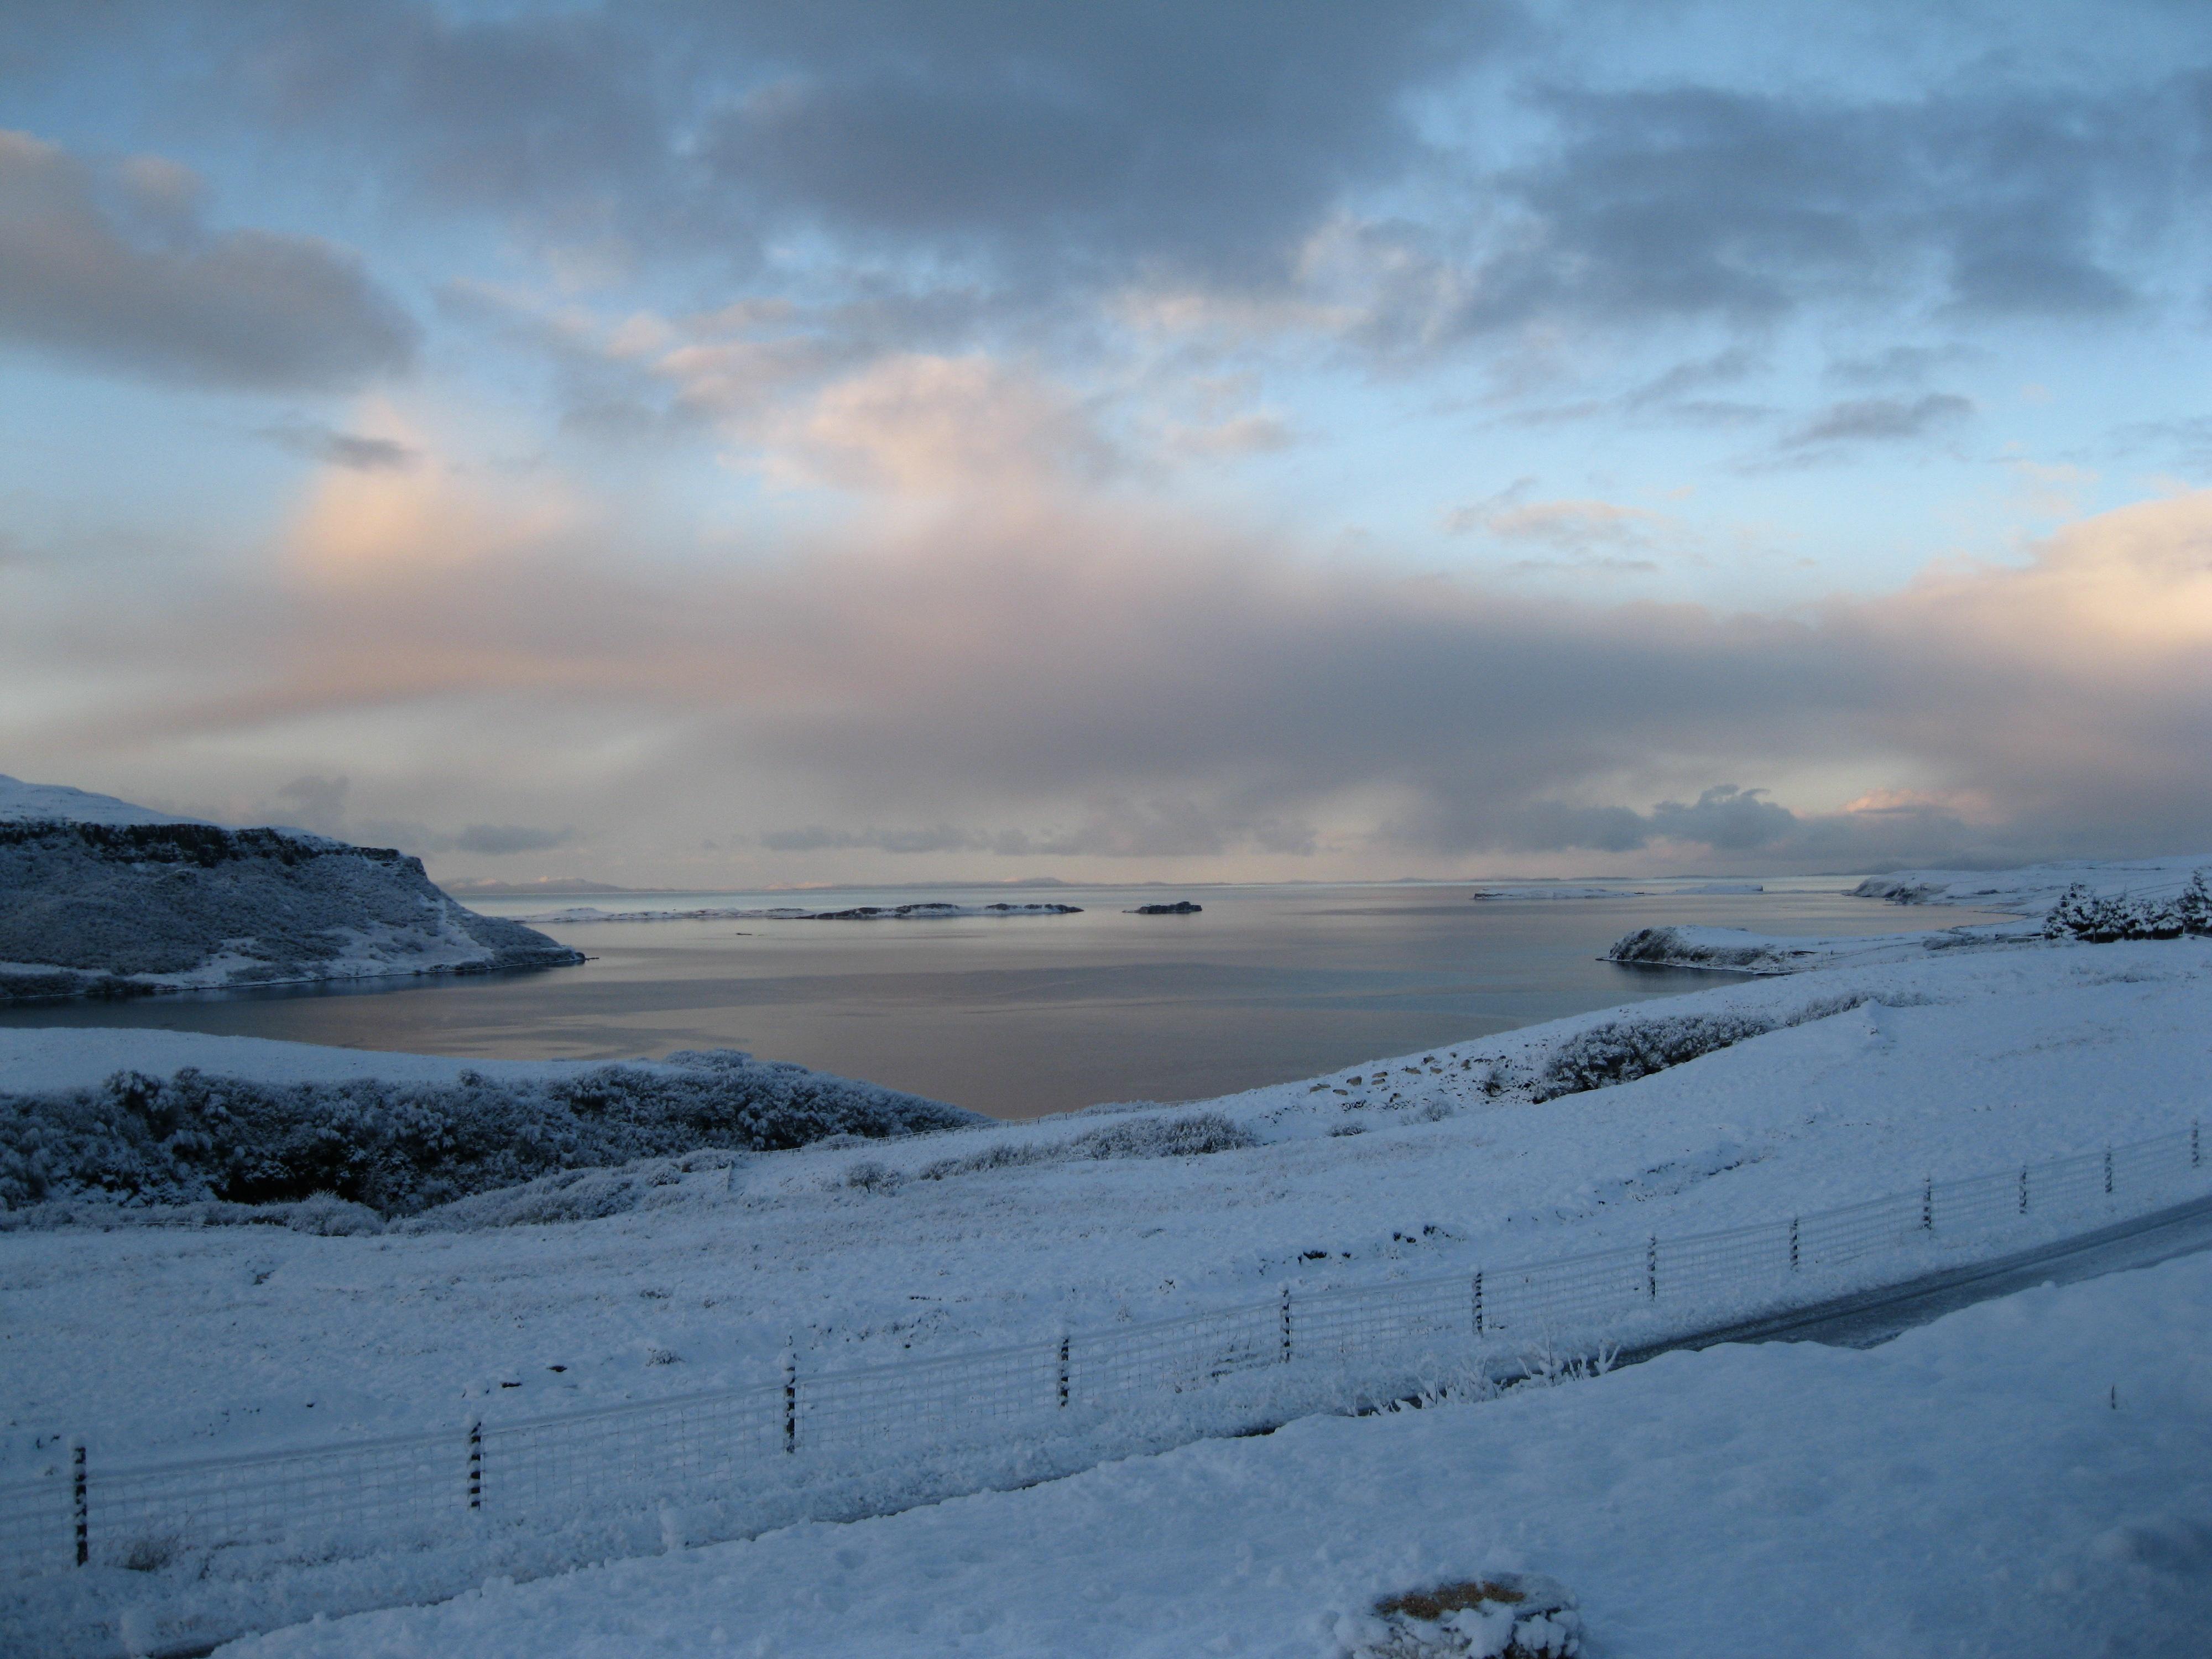 Snowy scene over the Loch